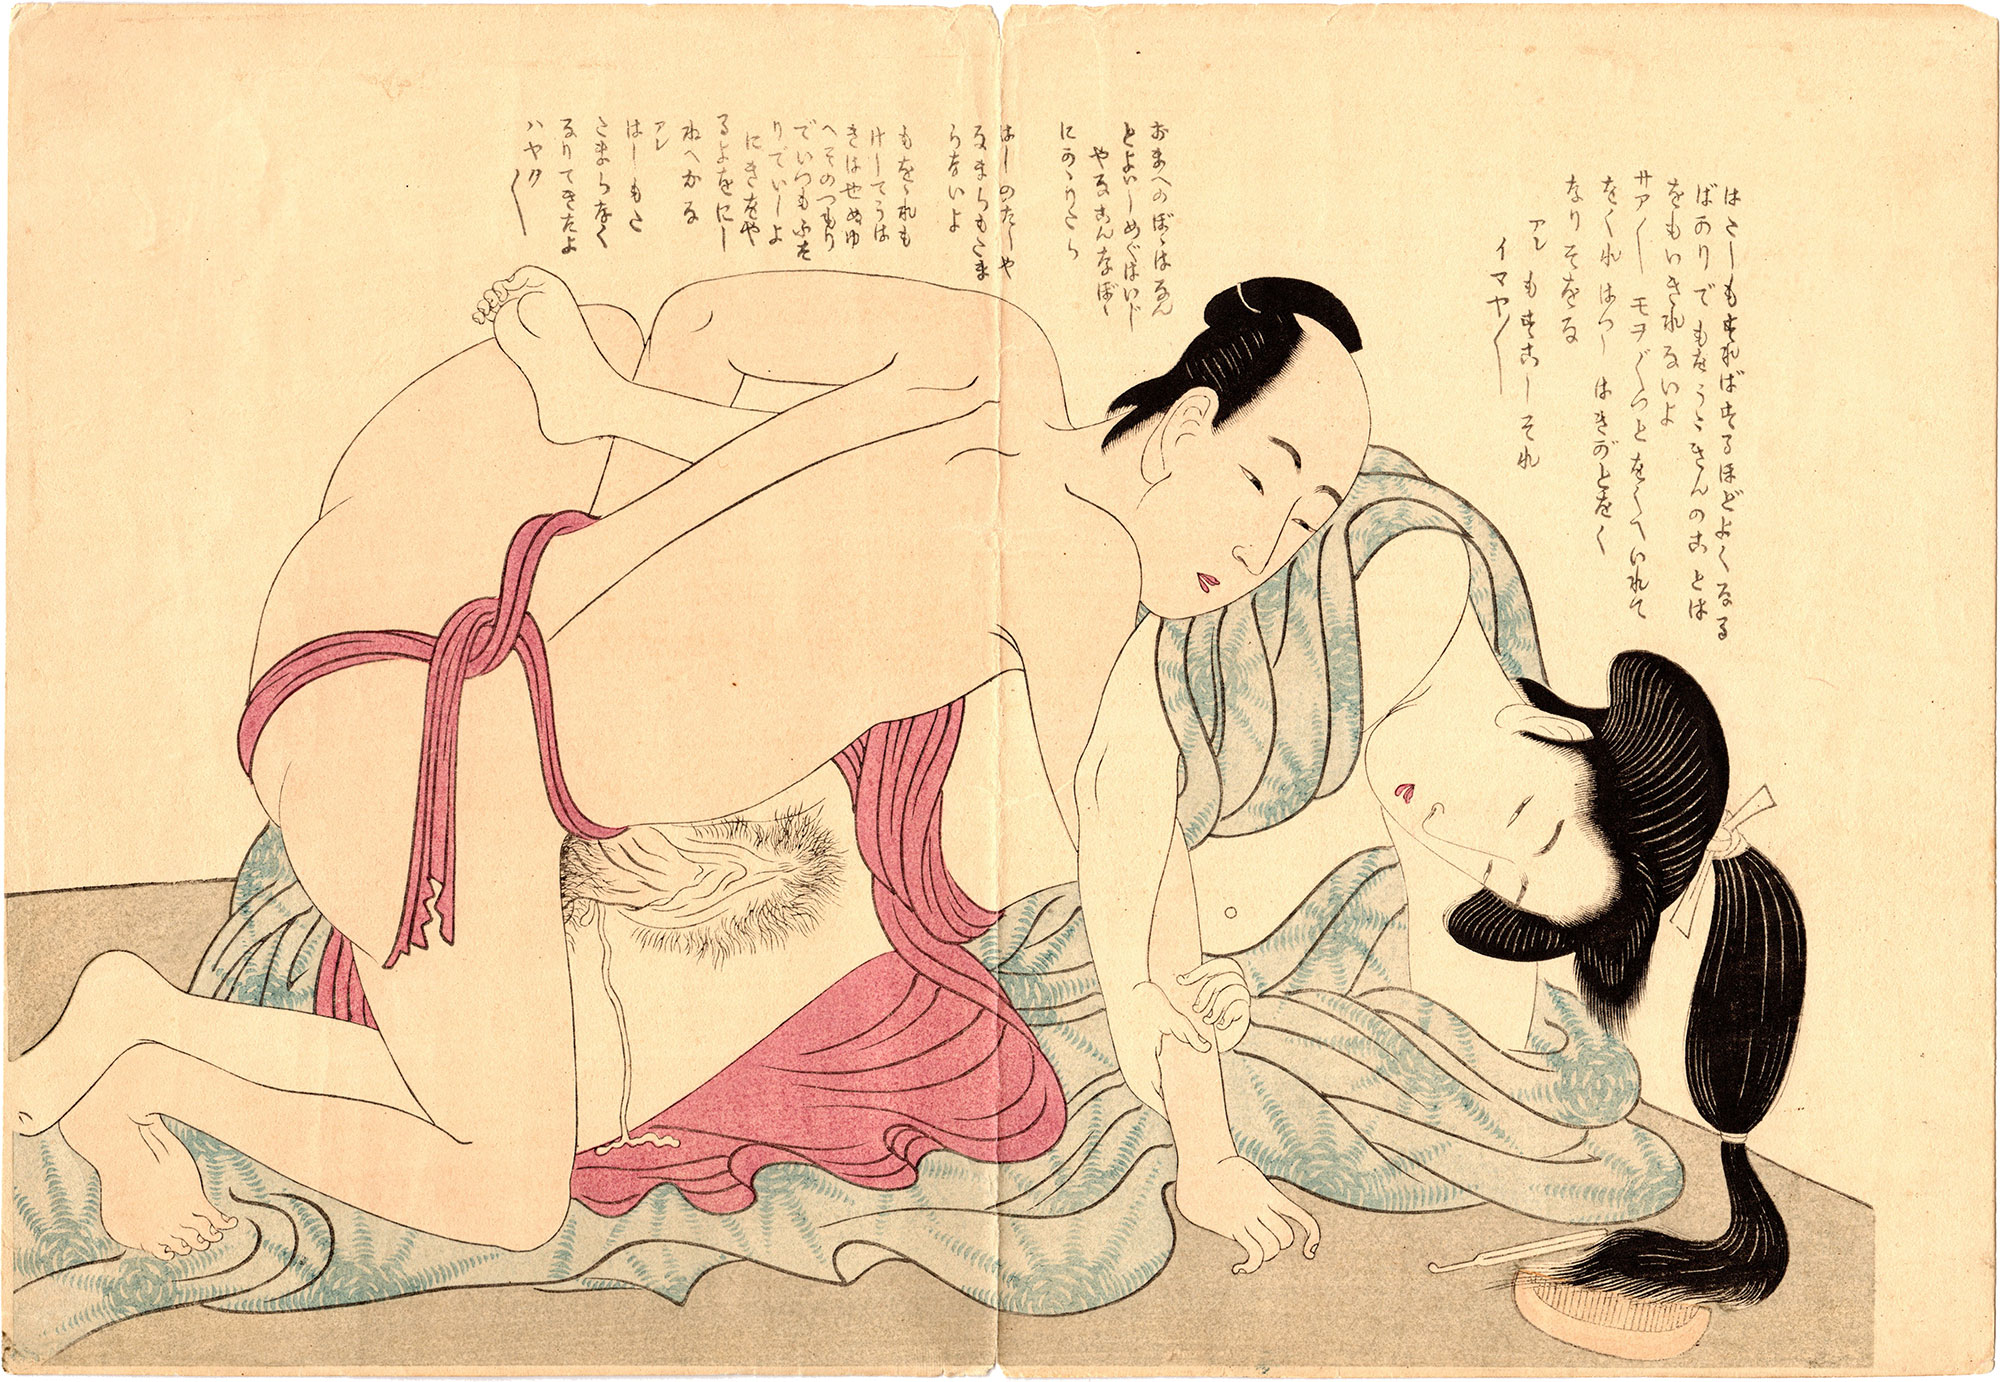 UNRAVELLING THE THREADS OF DESIRE 04 (Kitagawa Utamaro)